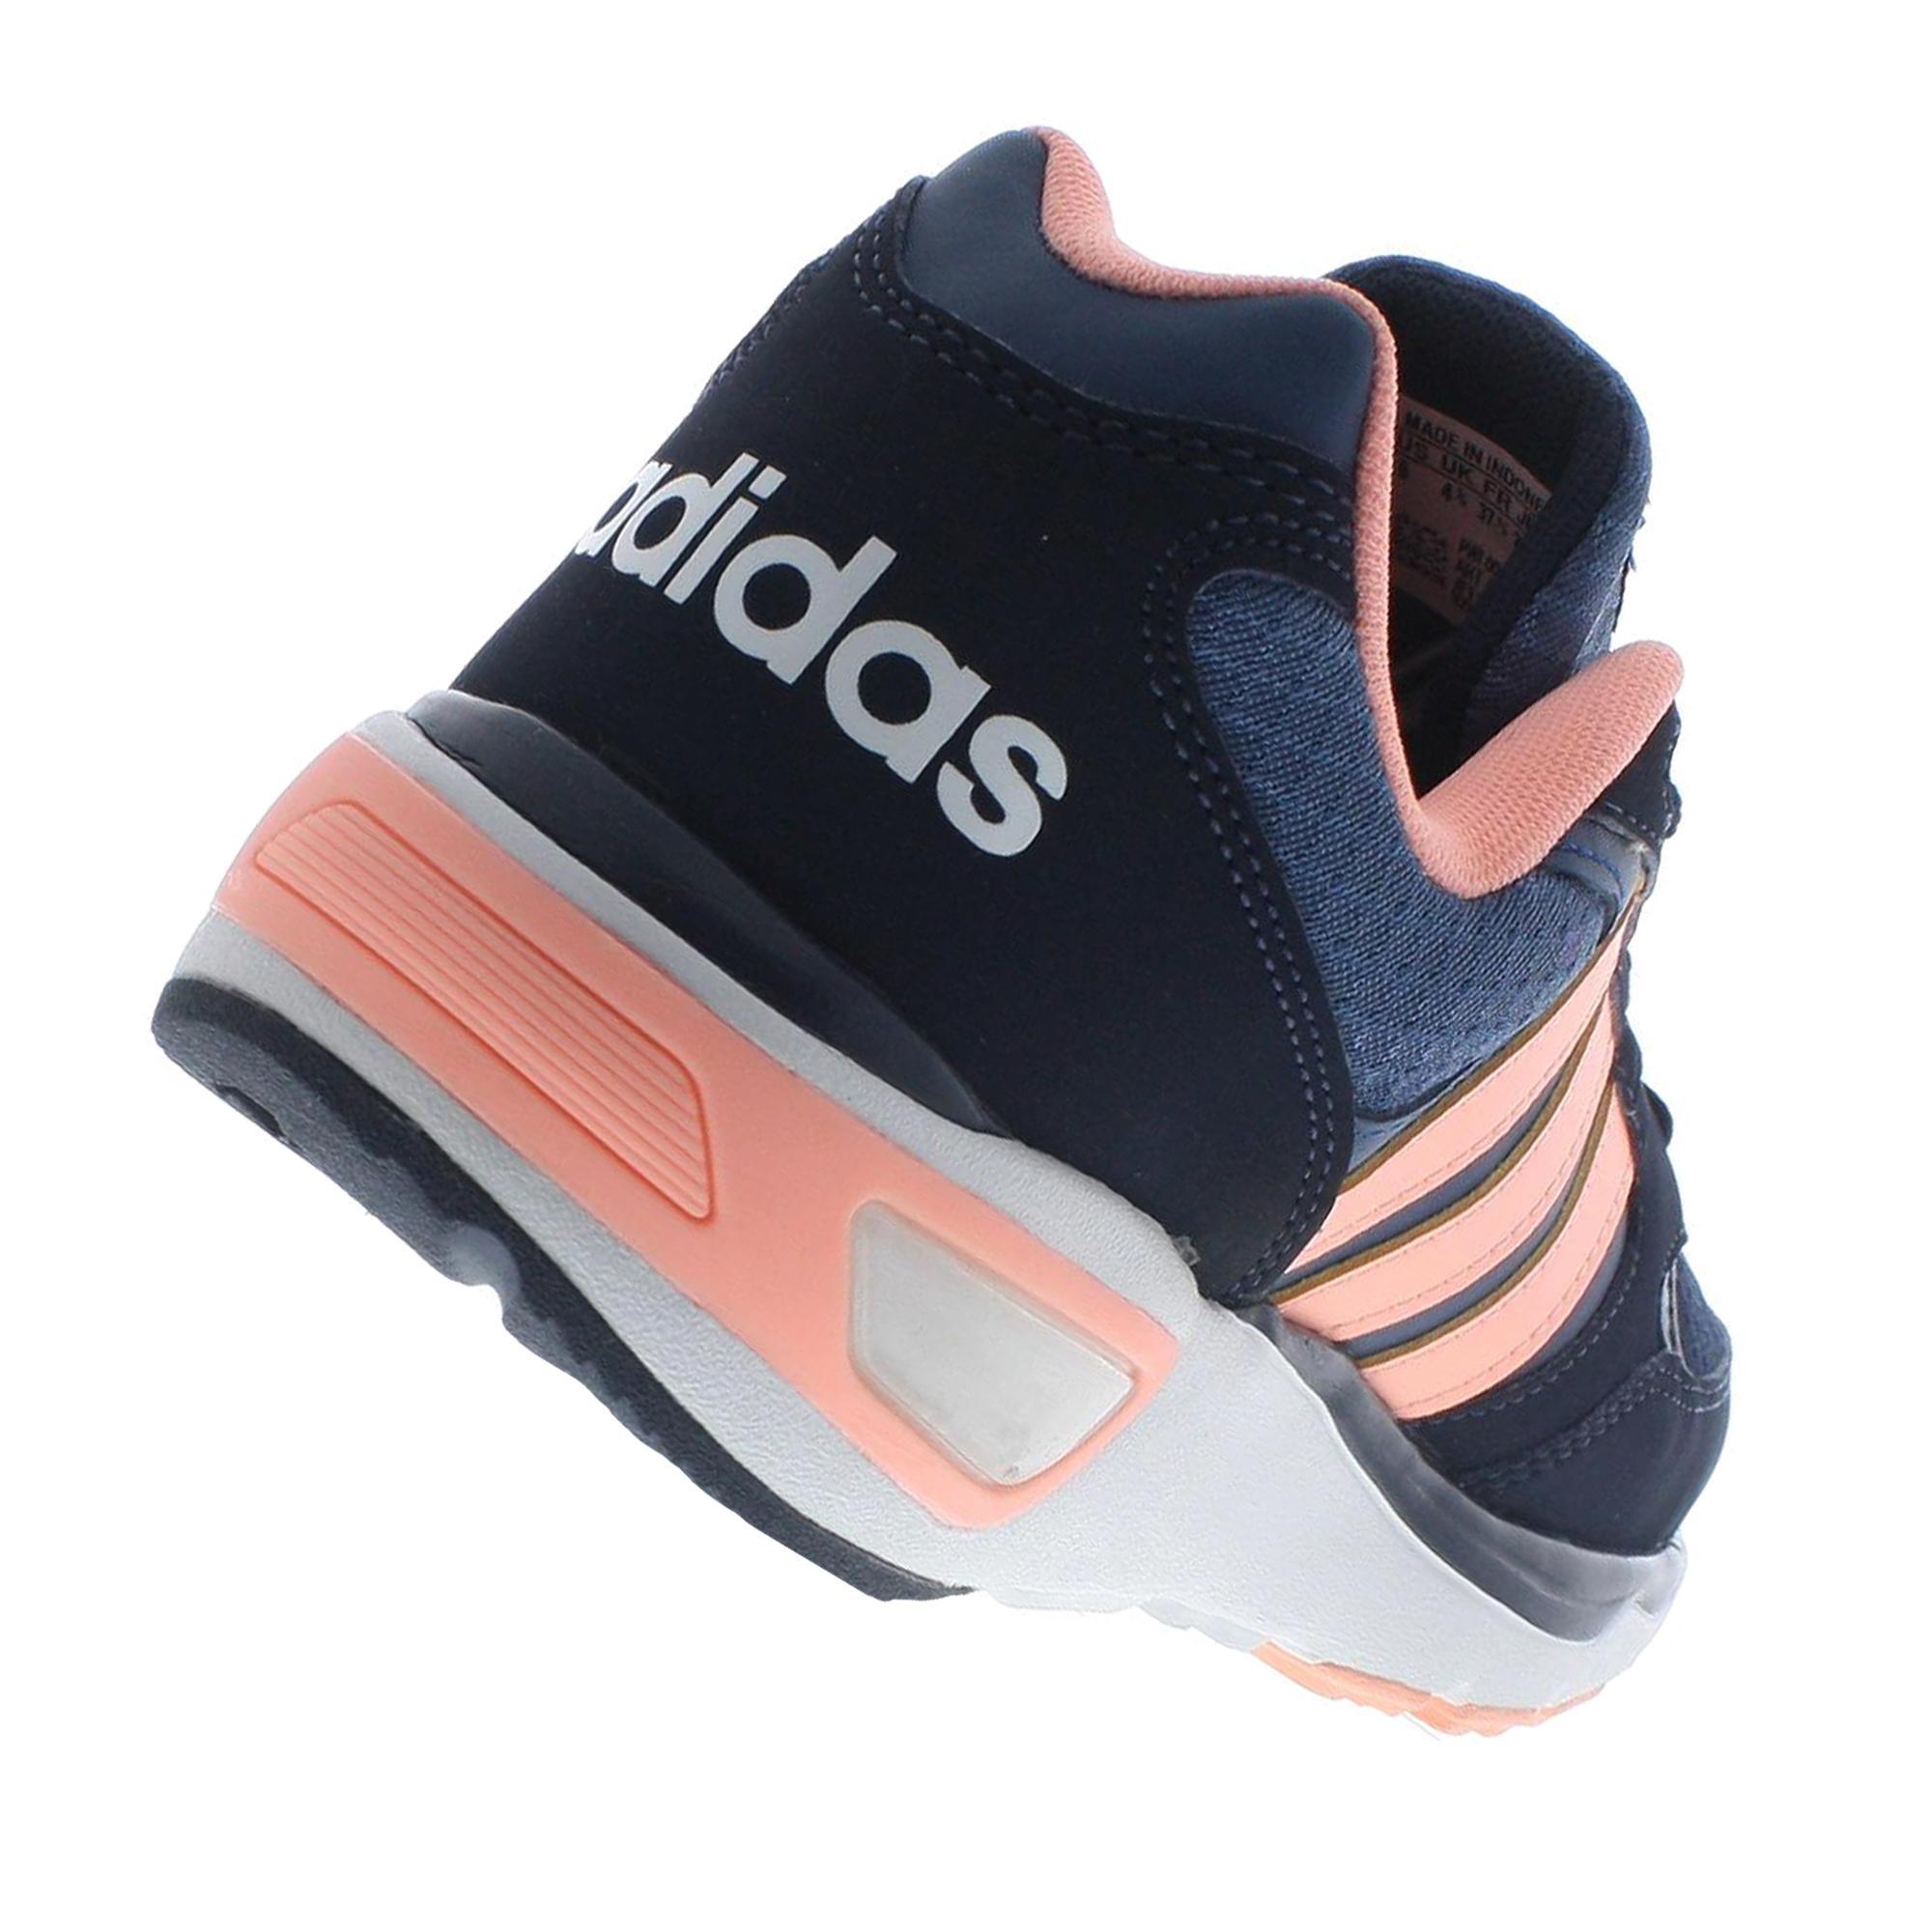 competitive price e5a9c fc8ec adidas Cloudfoam 8 Tis SS16 Kadın Spor Ayakkabı